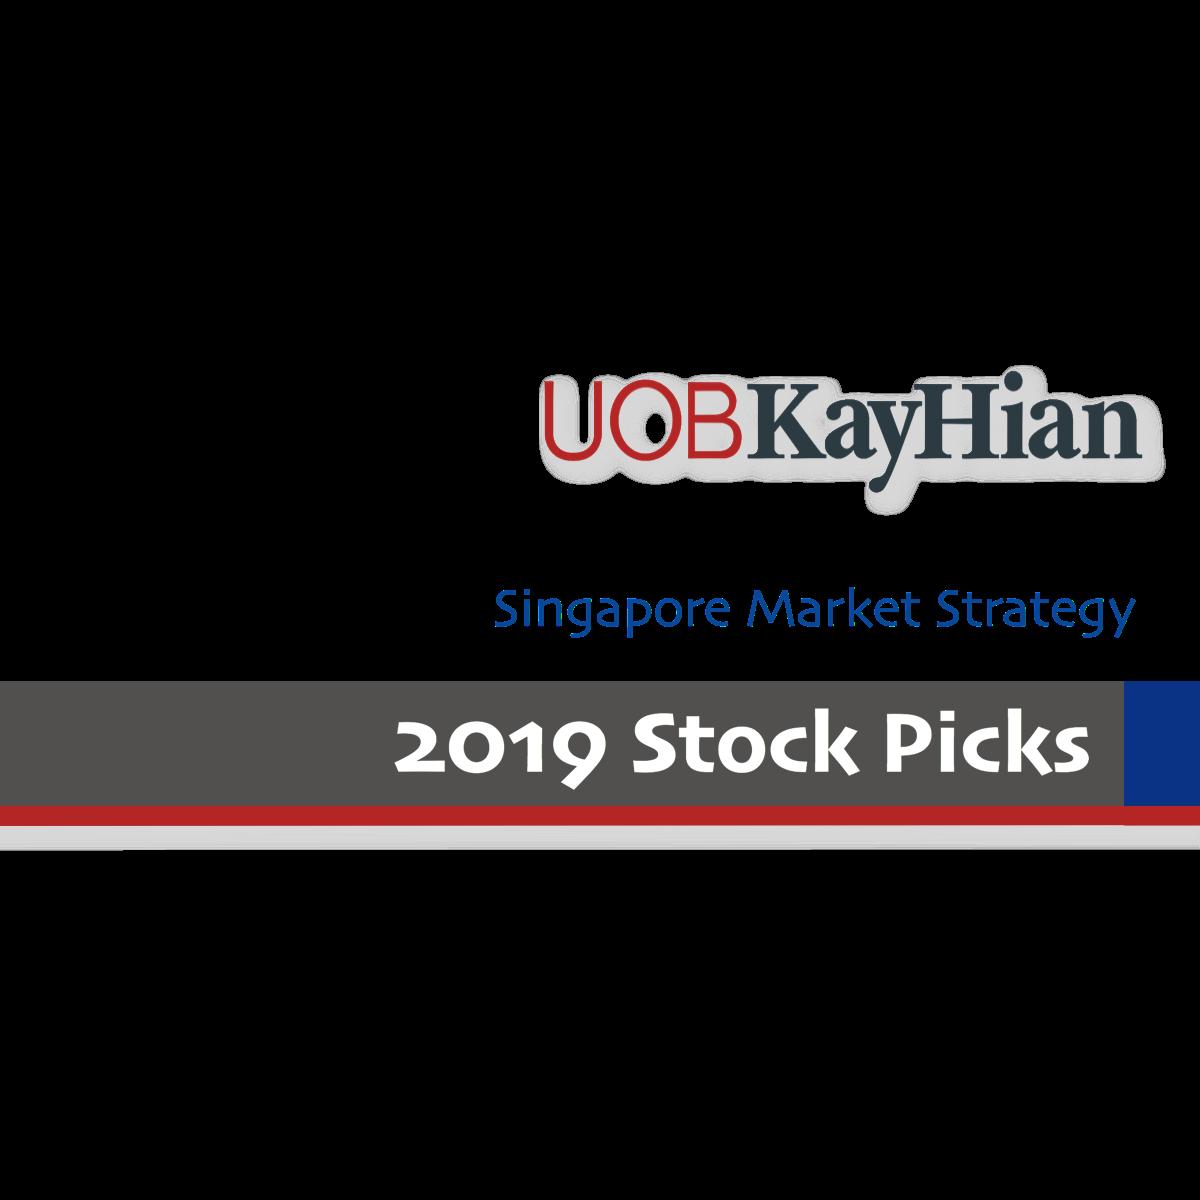 Singapore Stock Picks 2019 - UOB Kay Hian Research | SGinvestors.io